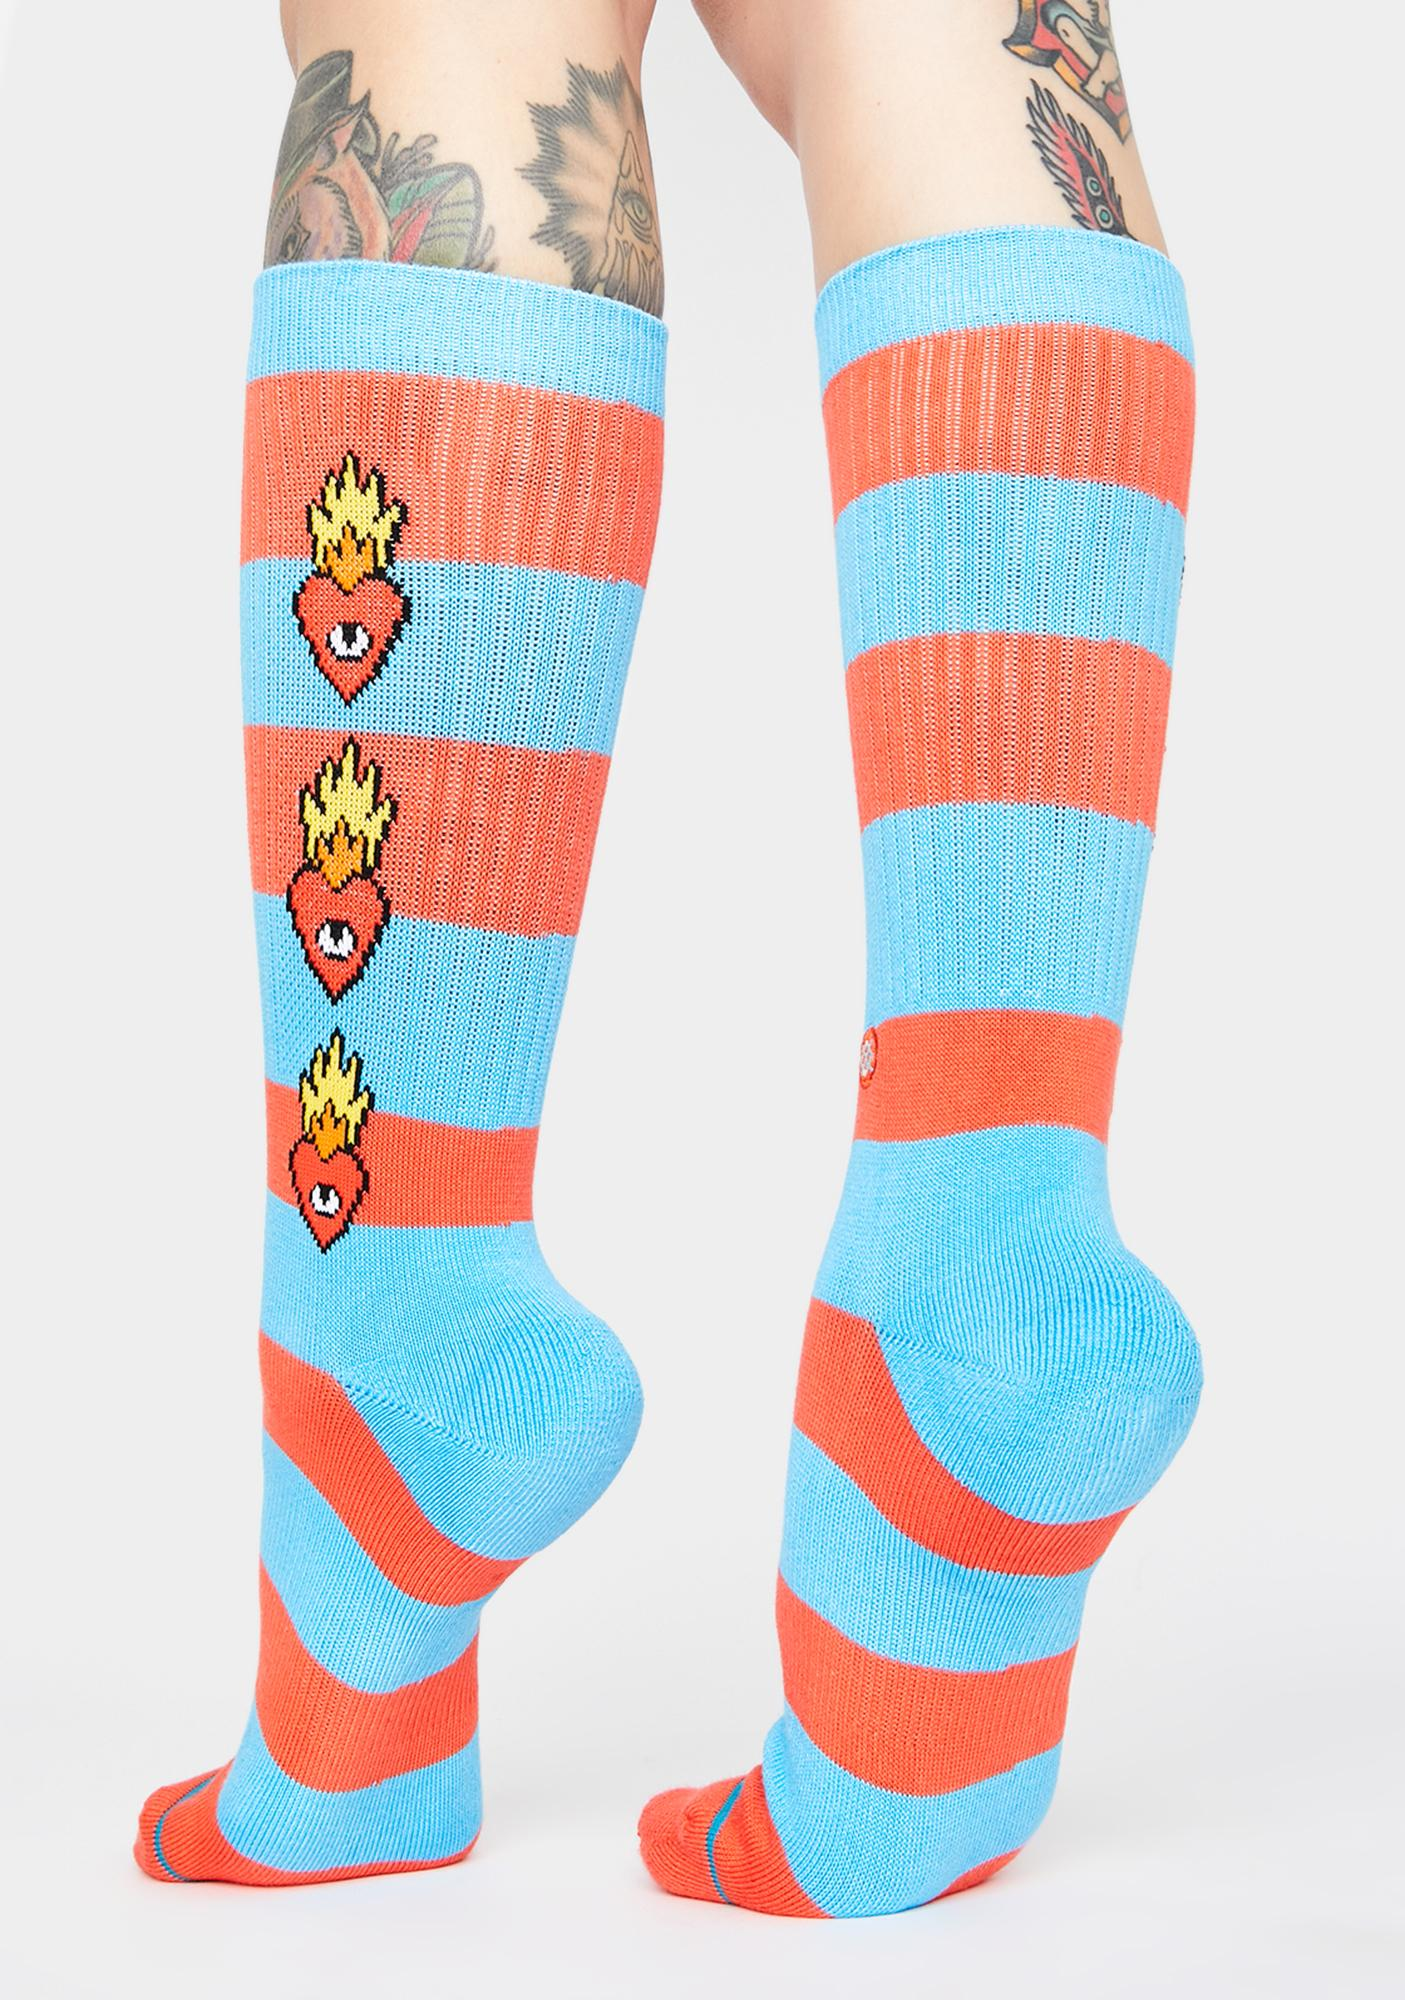 Stance x Ricardo Cavolo Heartless Crew Socks